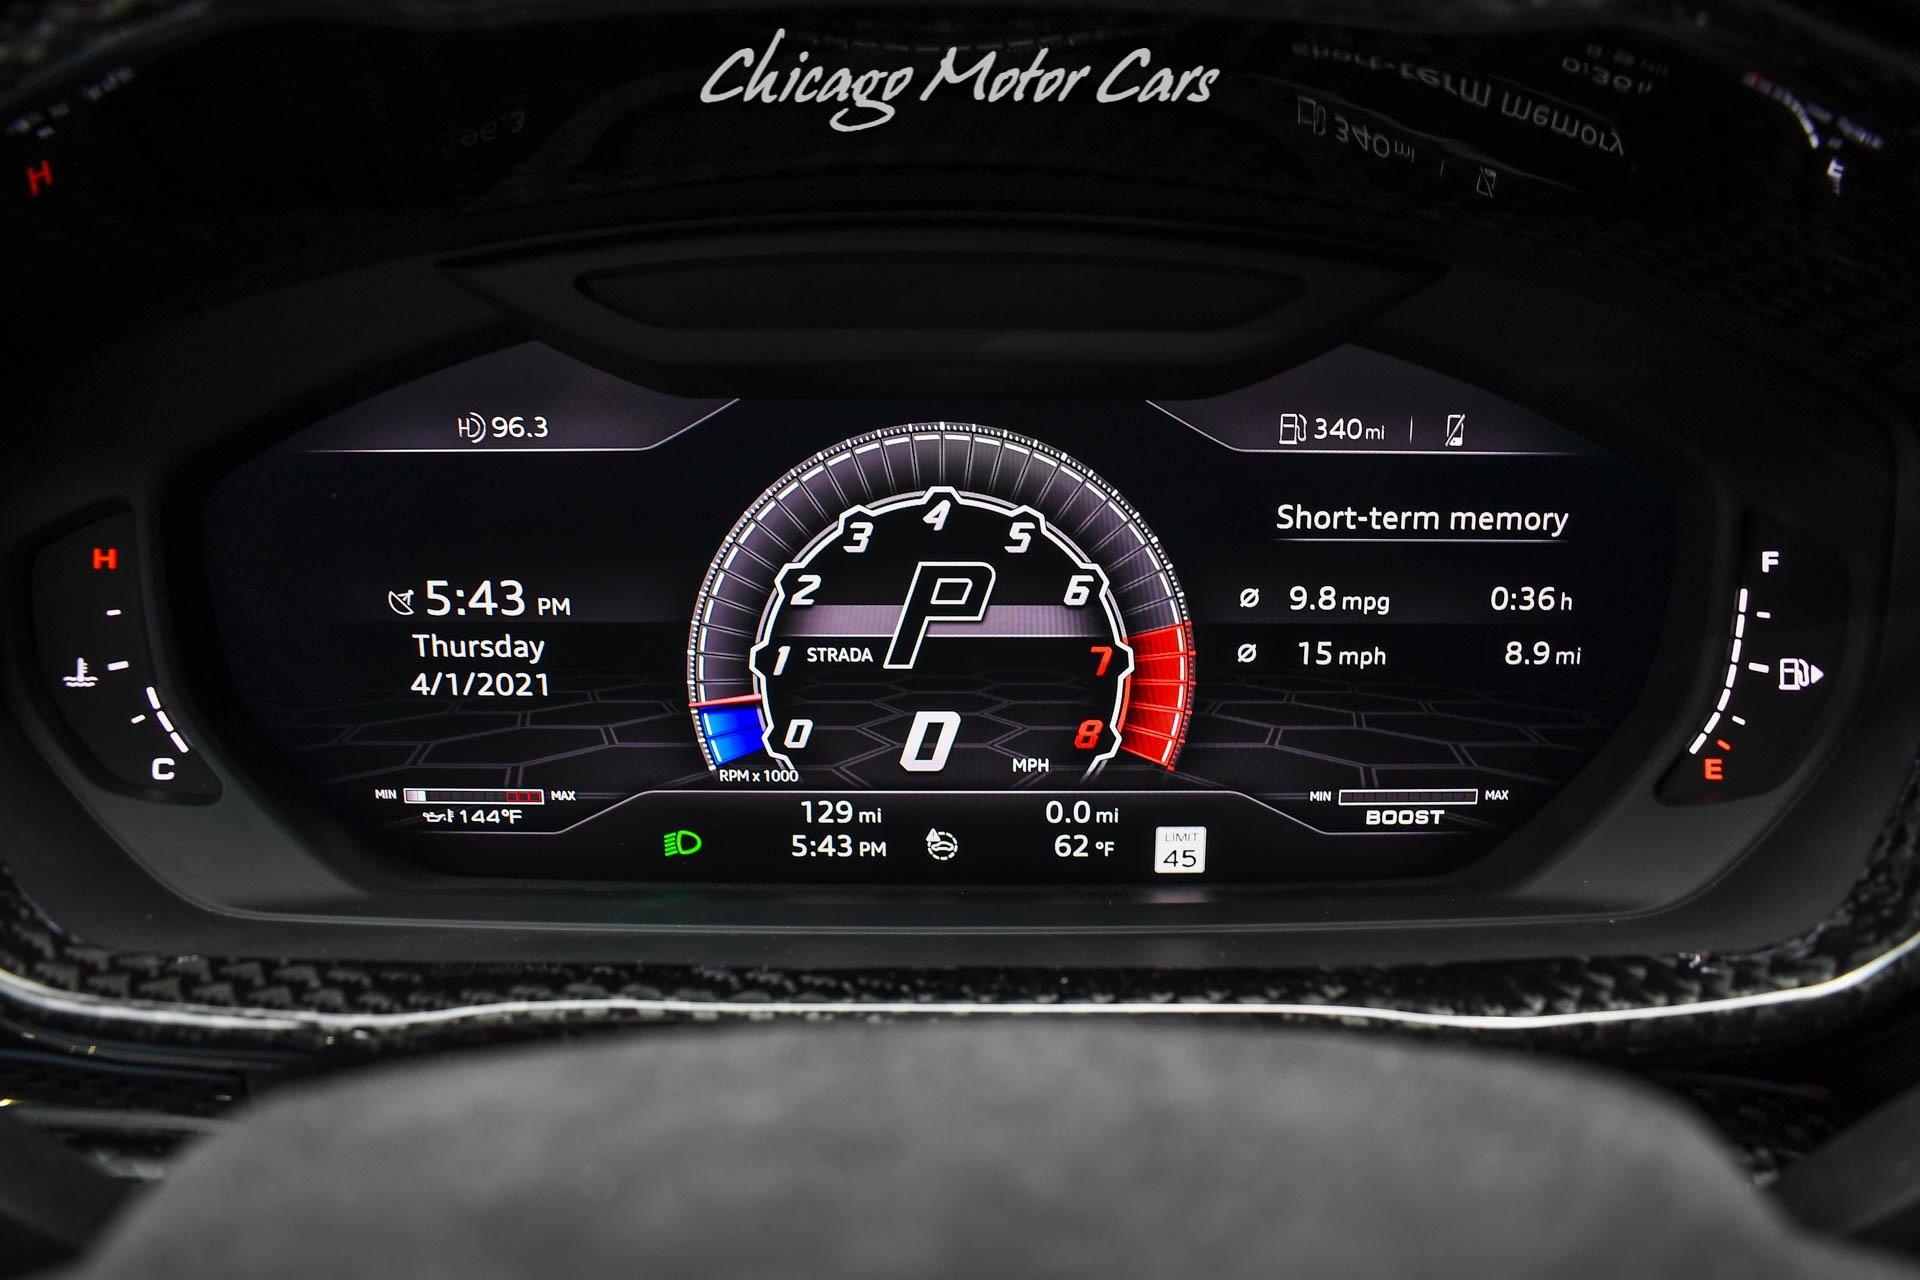 Used-2020-Lamborghini-Urus-SUV-MANSORY-Wide-Body-Carbonado-Stealth-SAVAGE-Edition-Full-Carbon-Fiber